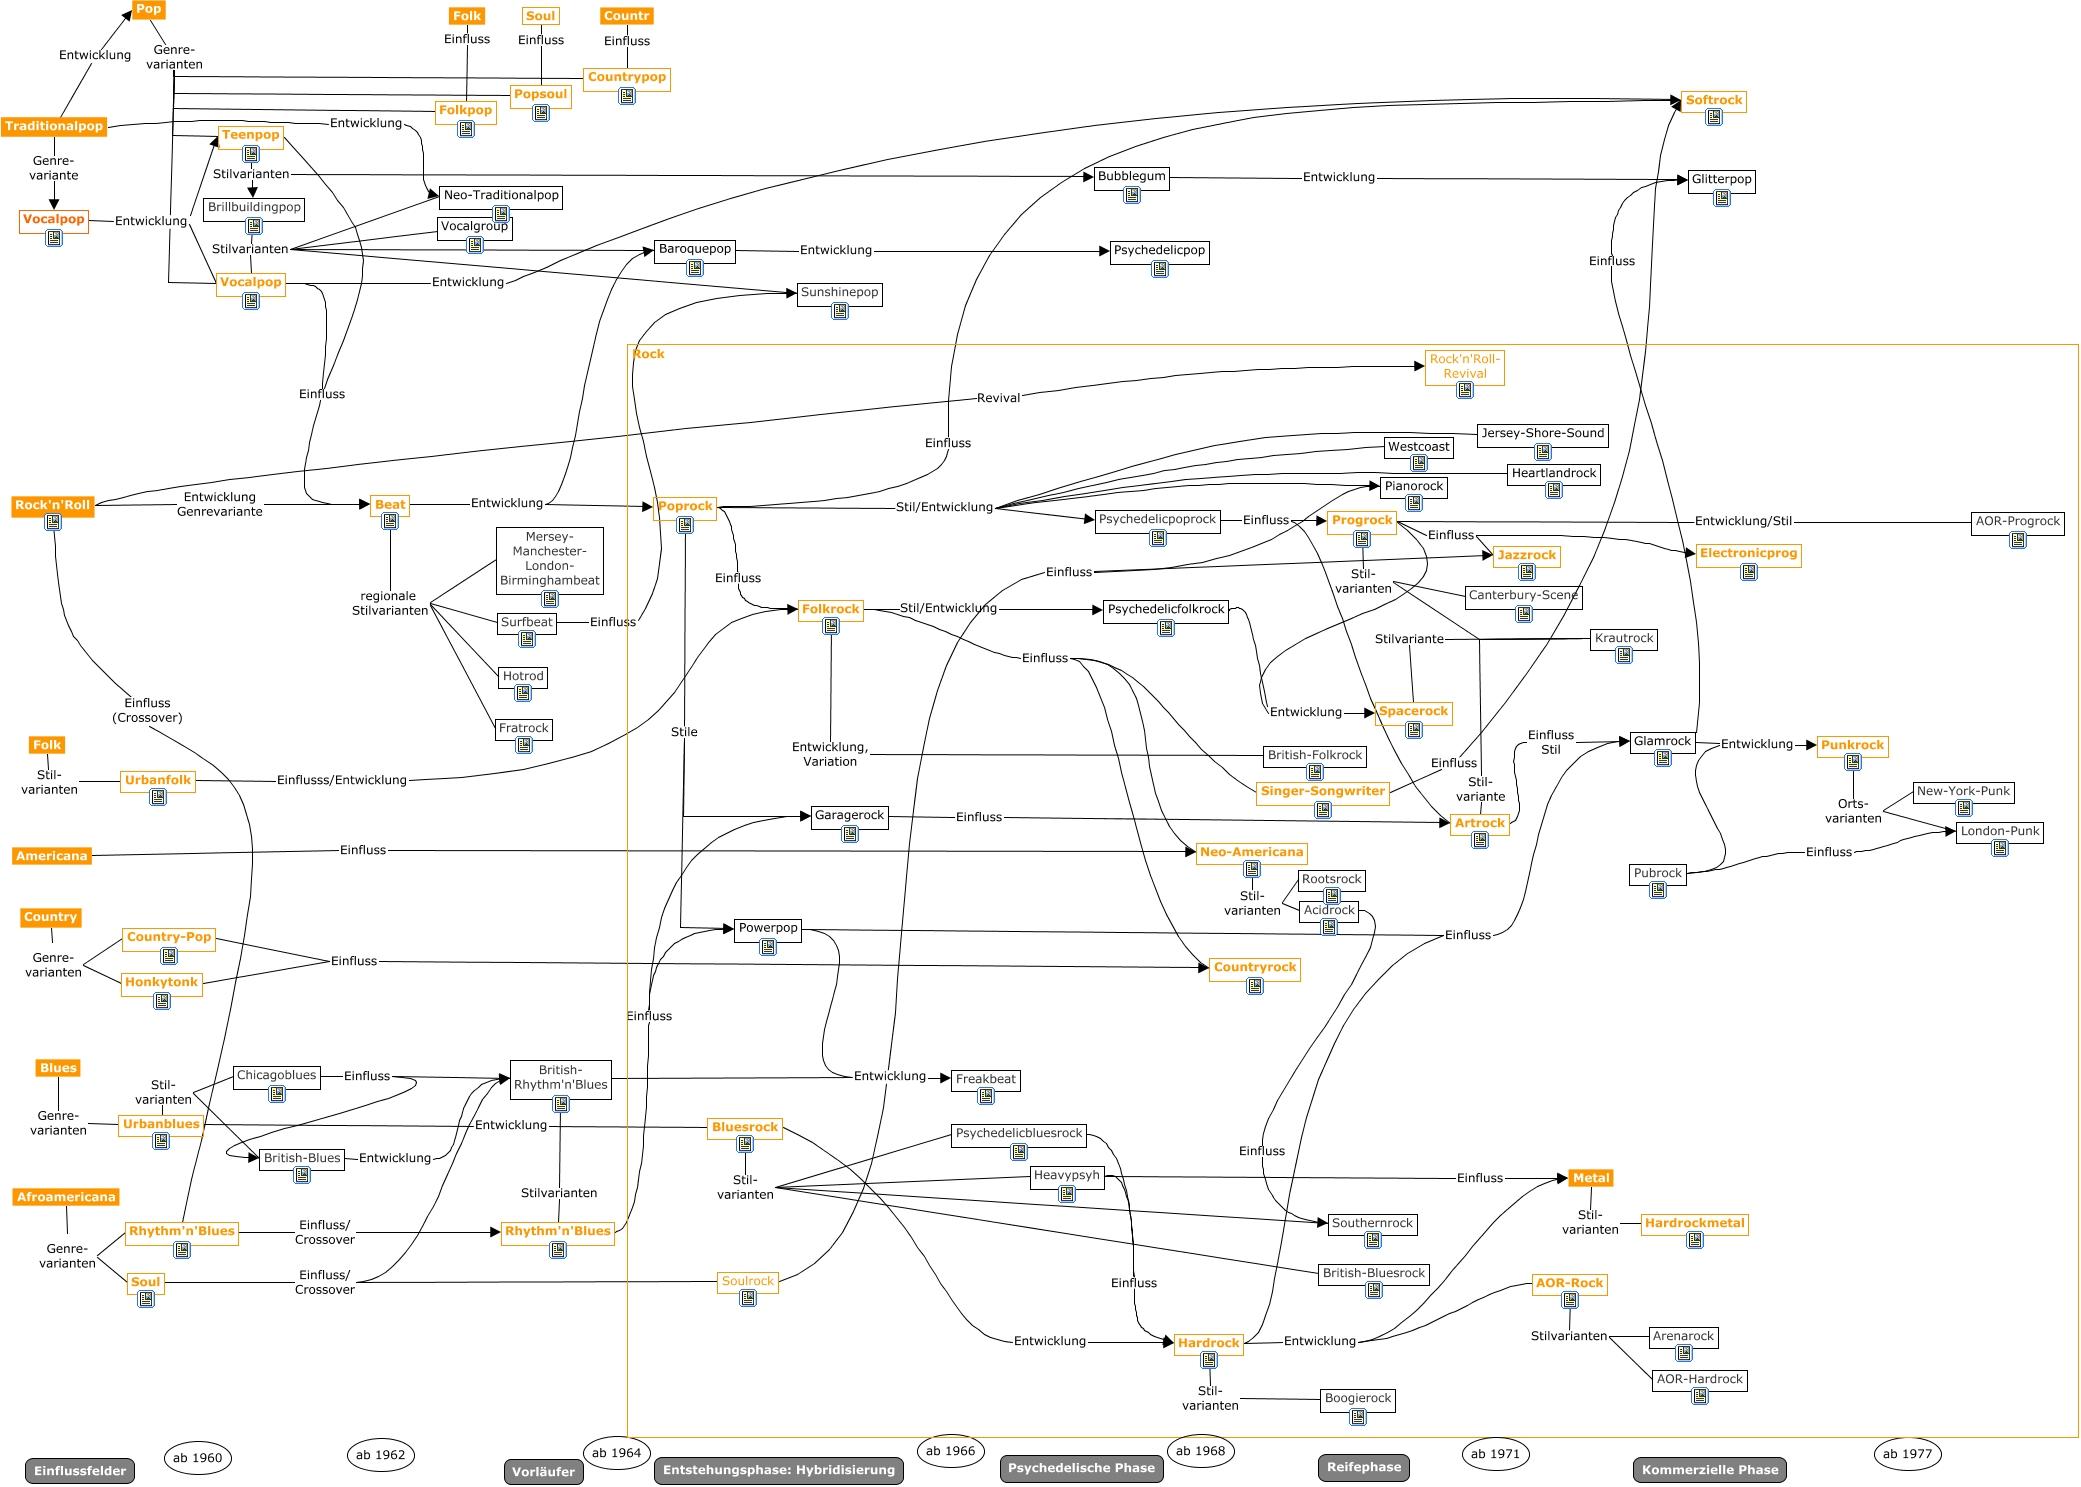 Genremap